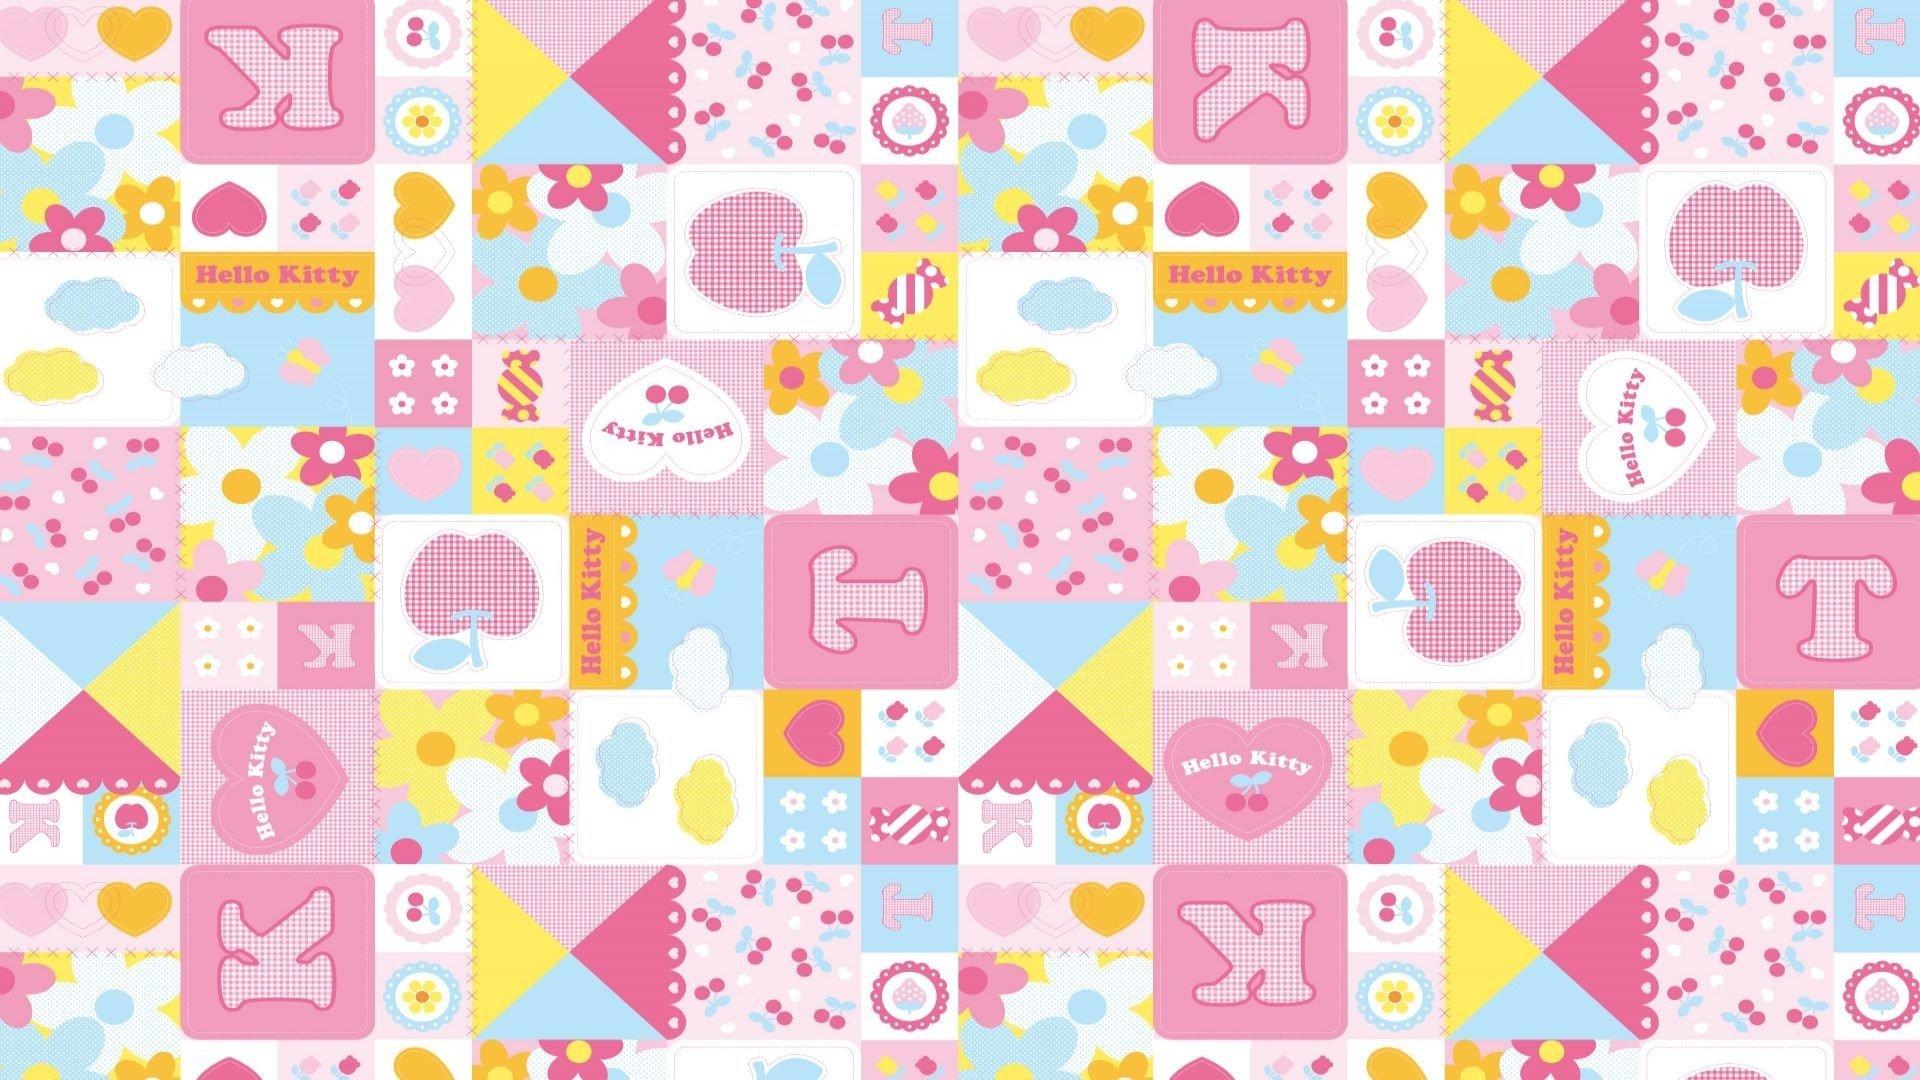 Hello Kitty Wallpaper HD